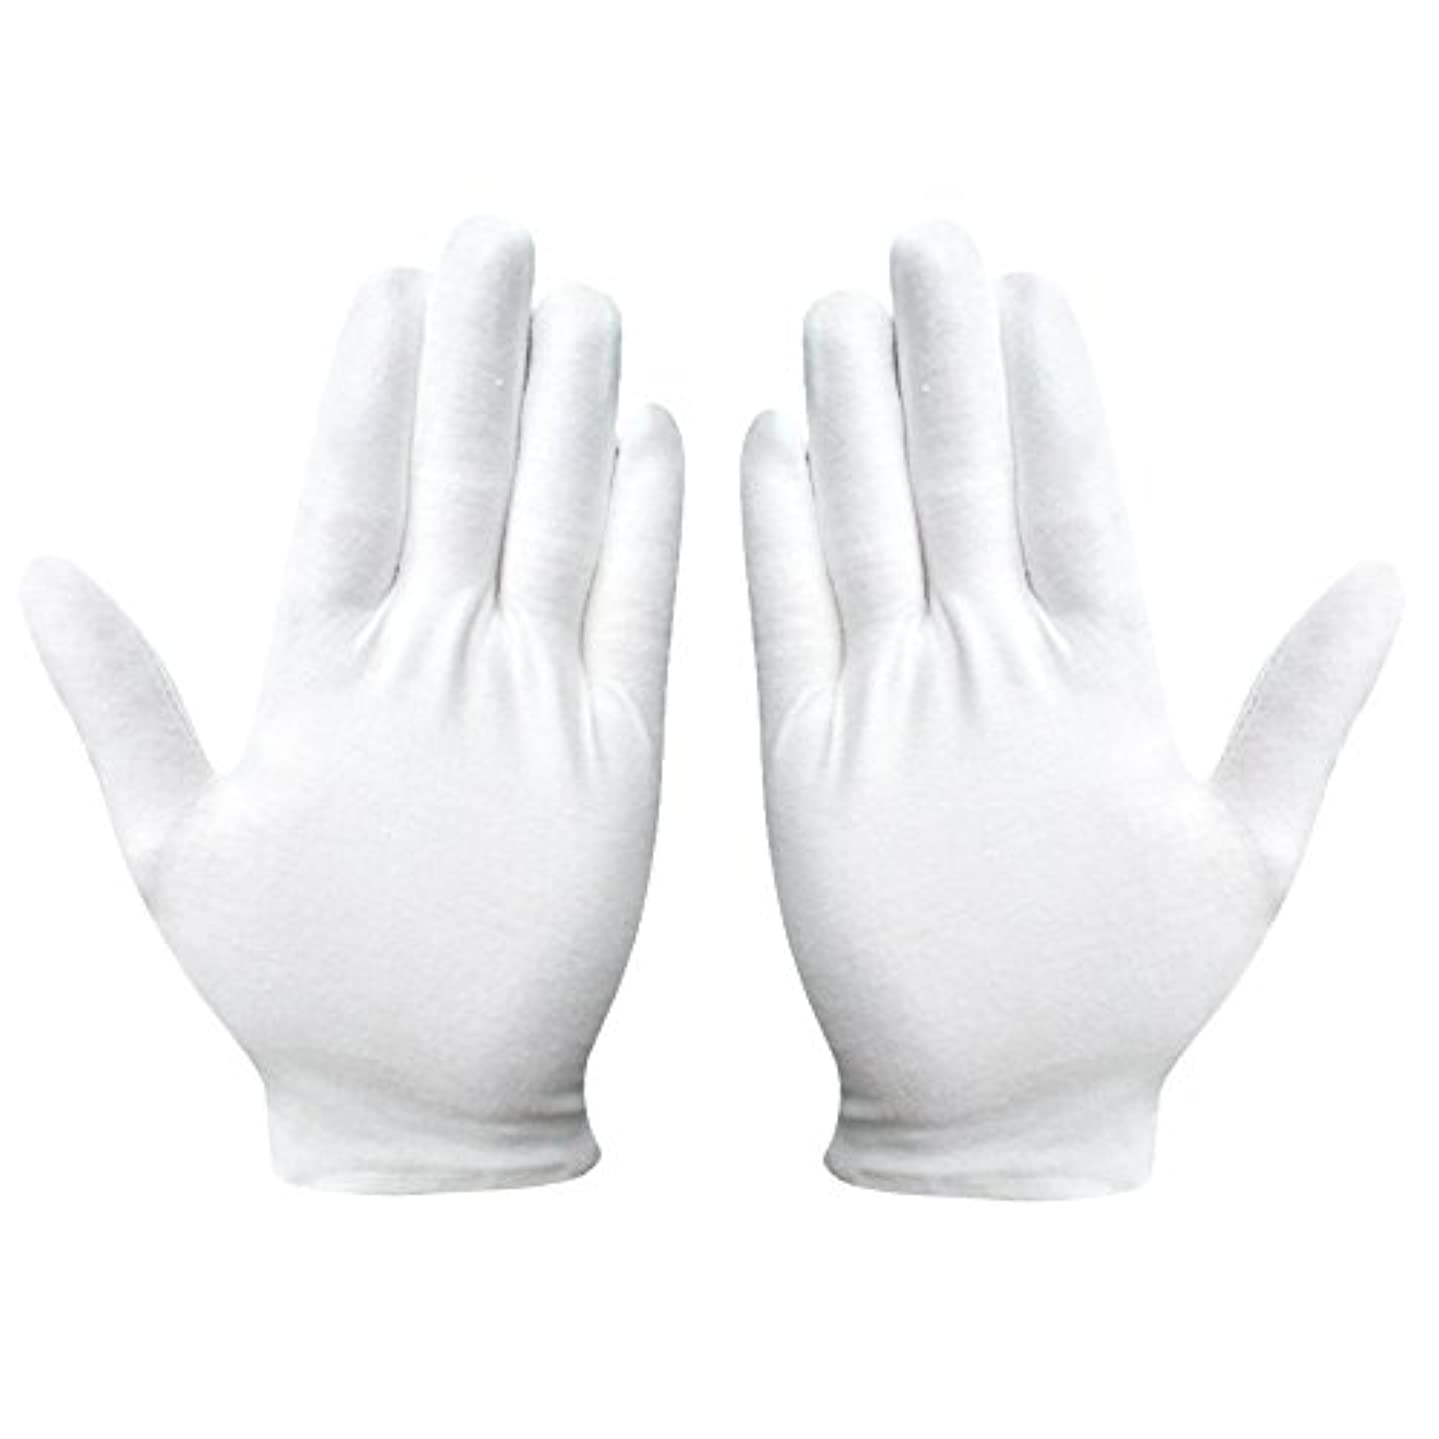 浸す石炭動員する綿手袋 純綿 コットン手袋 白手袋 薄手 通気性 手荒れ予防 【湿疹用 乾燥肌用 保湿用 礼装用】12双組